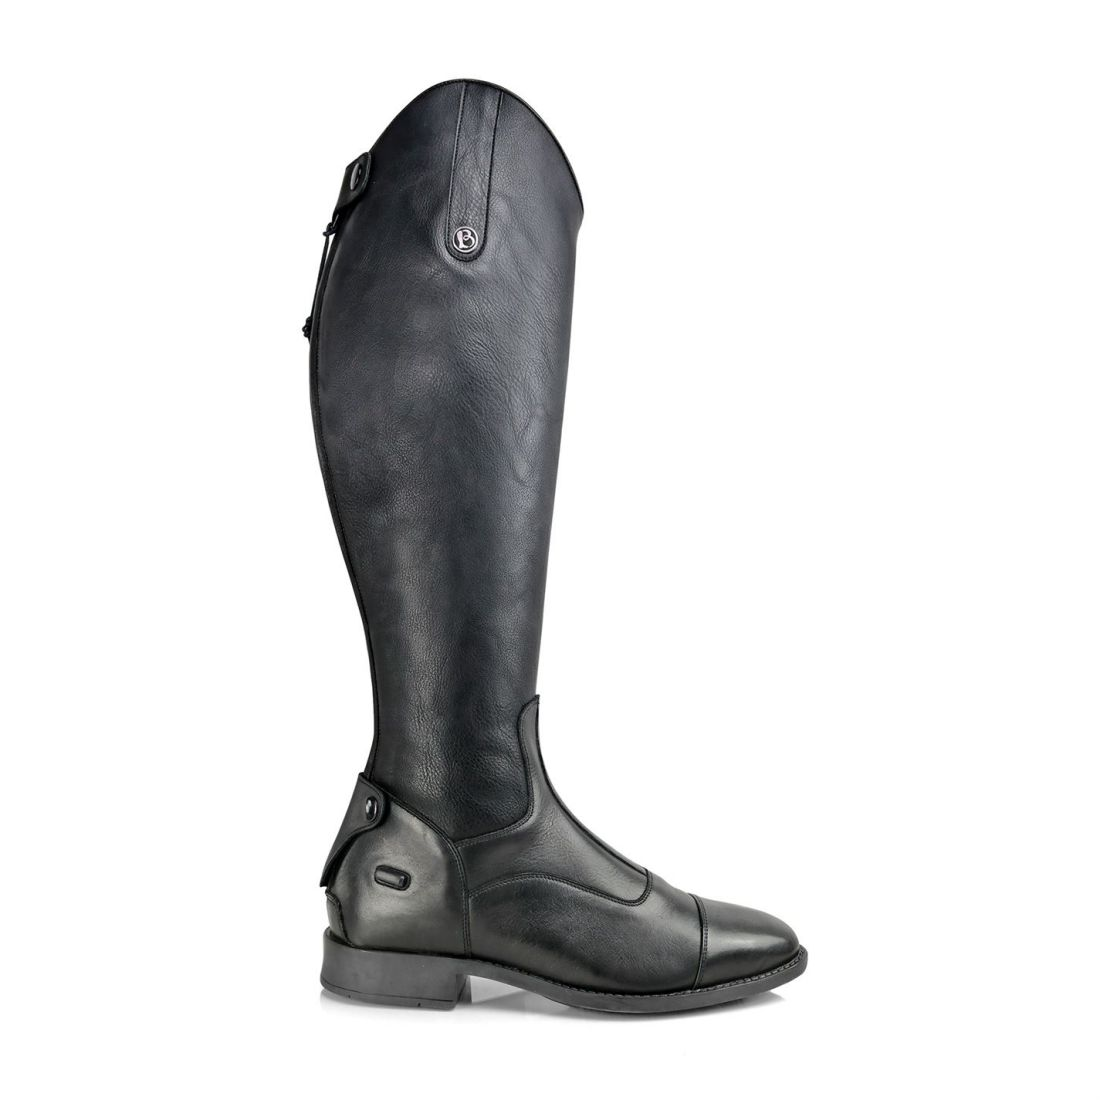 BROGINI Unisex Casperia largo botas de montar caballos calzado de entrenamiento